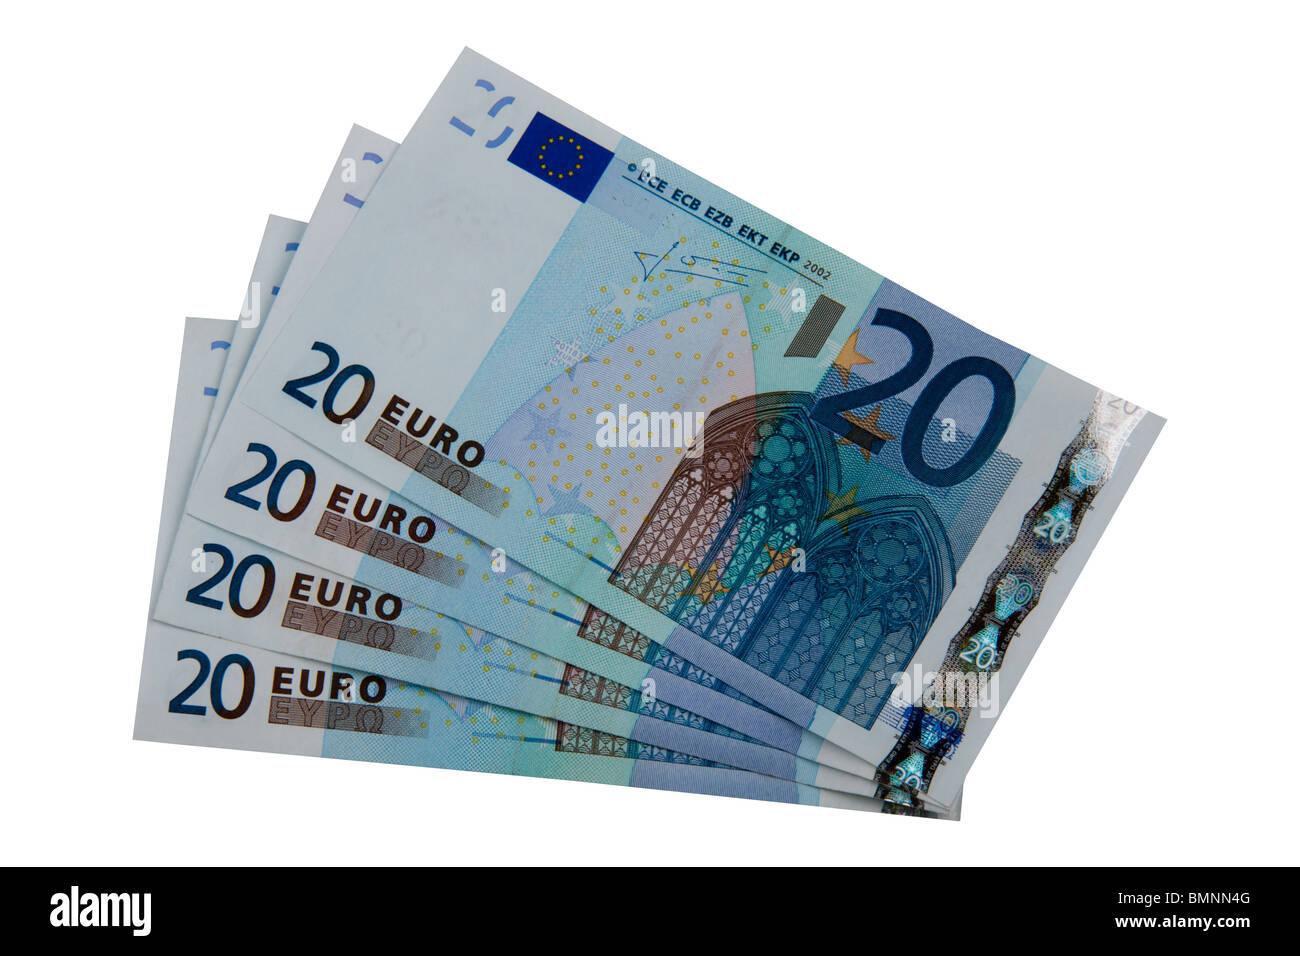 20 euro rechnung stockfotos 20 euro rechnung bilder alamy. Black Bedroom Furniture Sets. Home Design Ideas